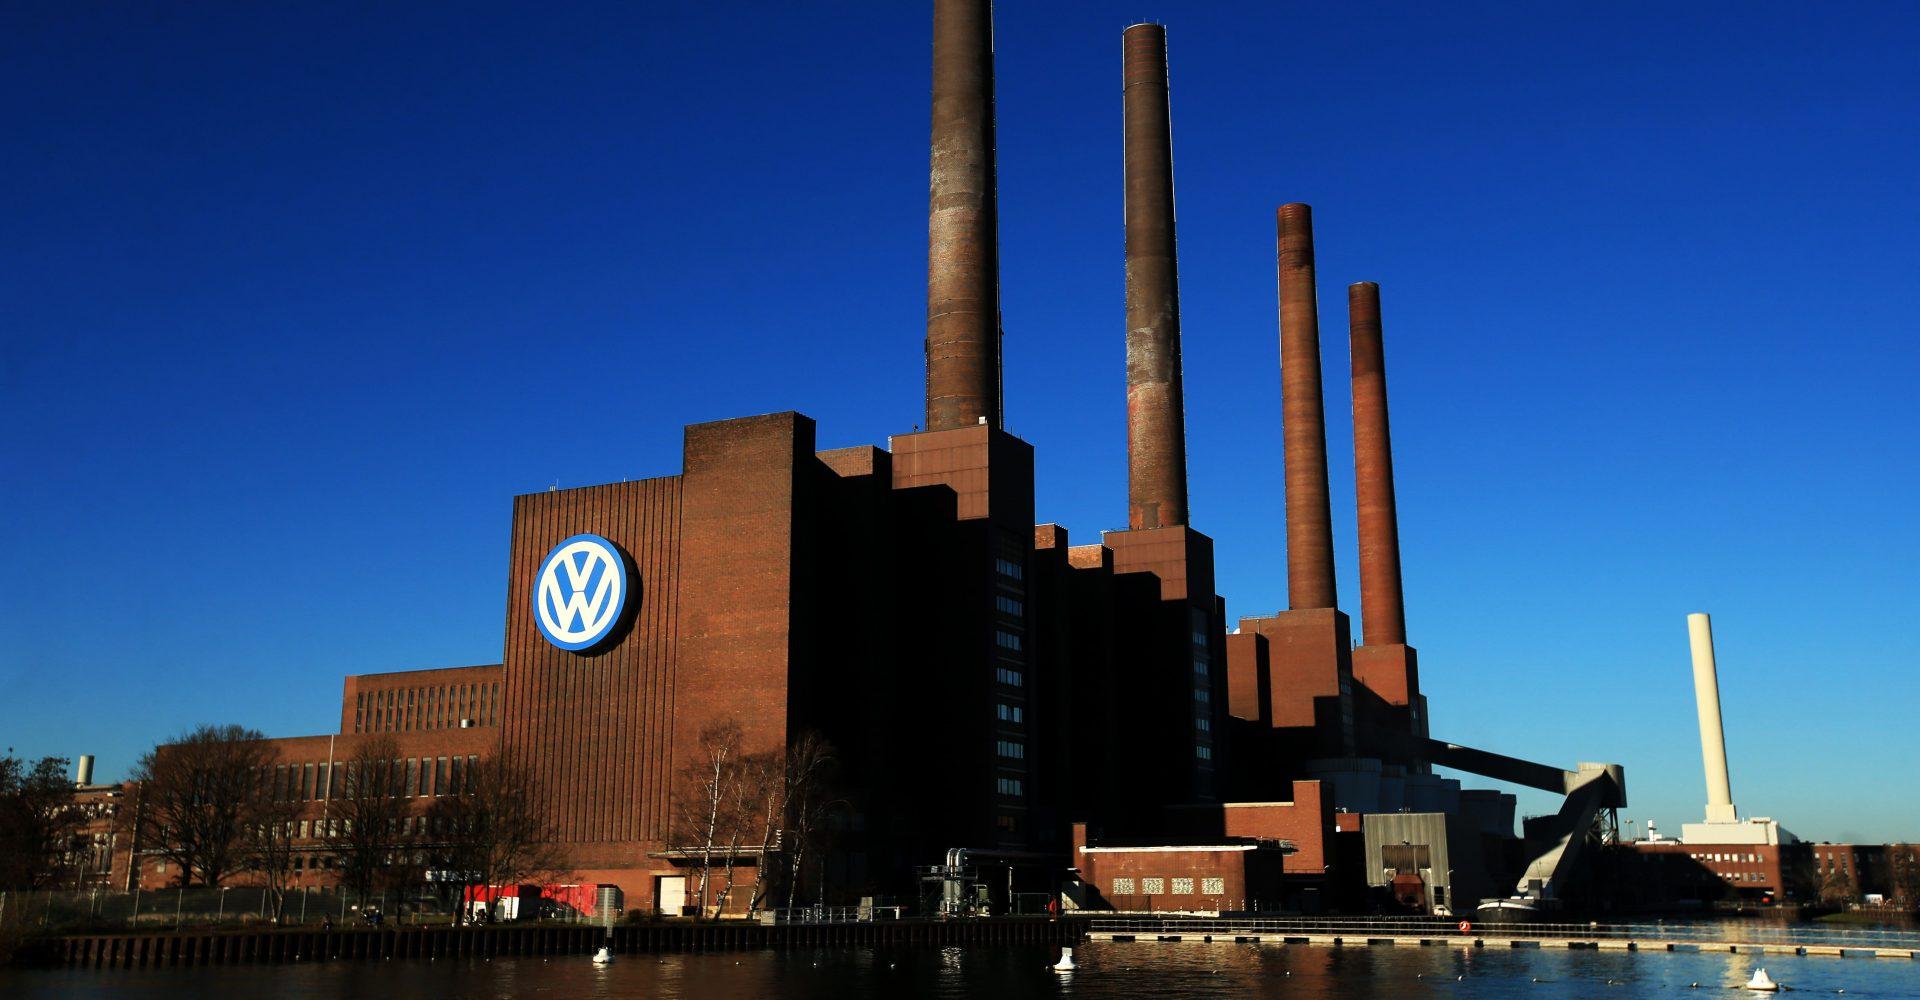 Former Volkswagen boss agrees to make payment over emissions scandal